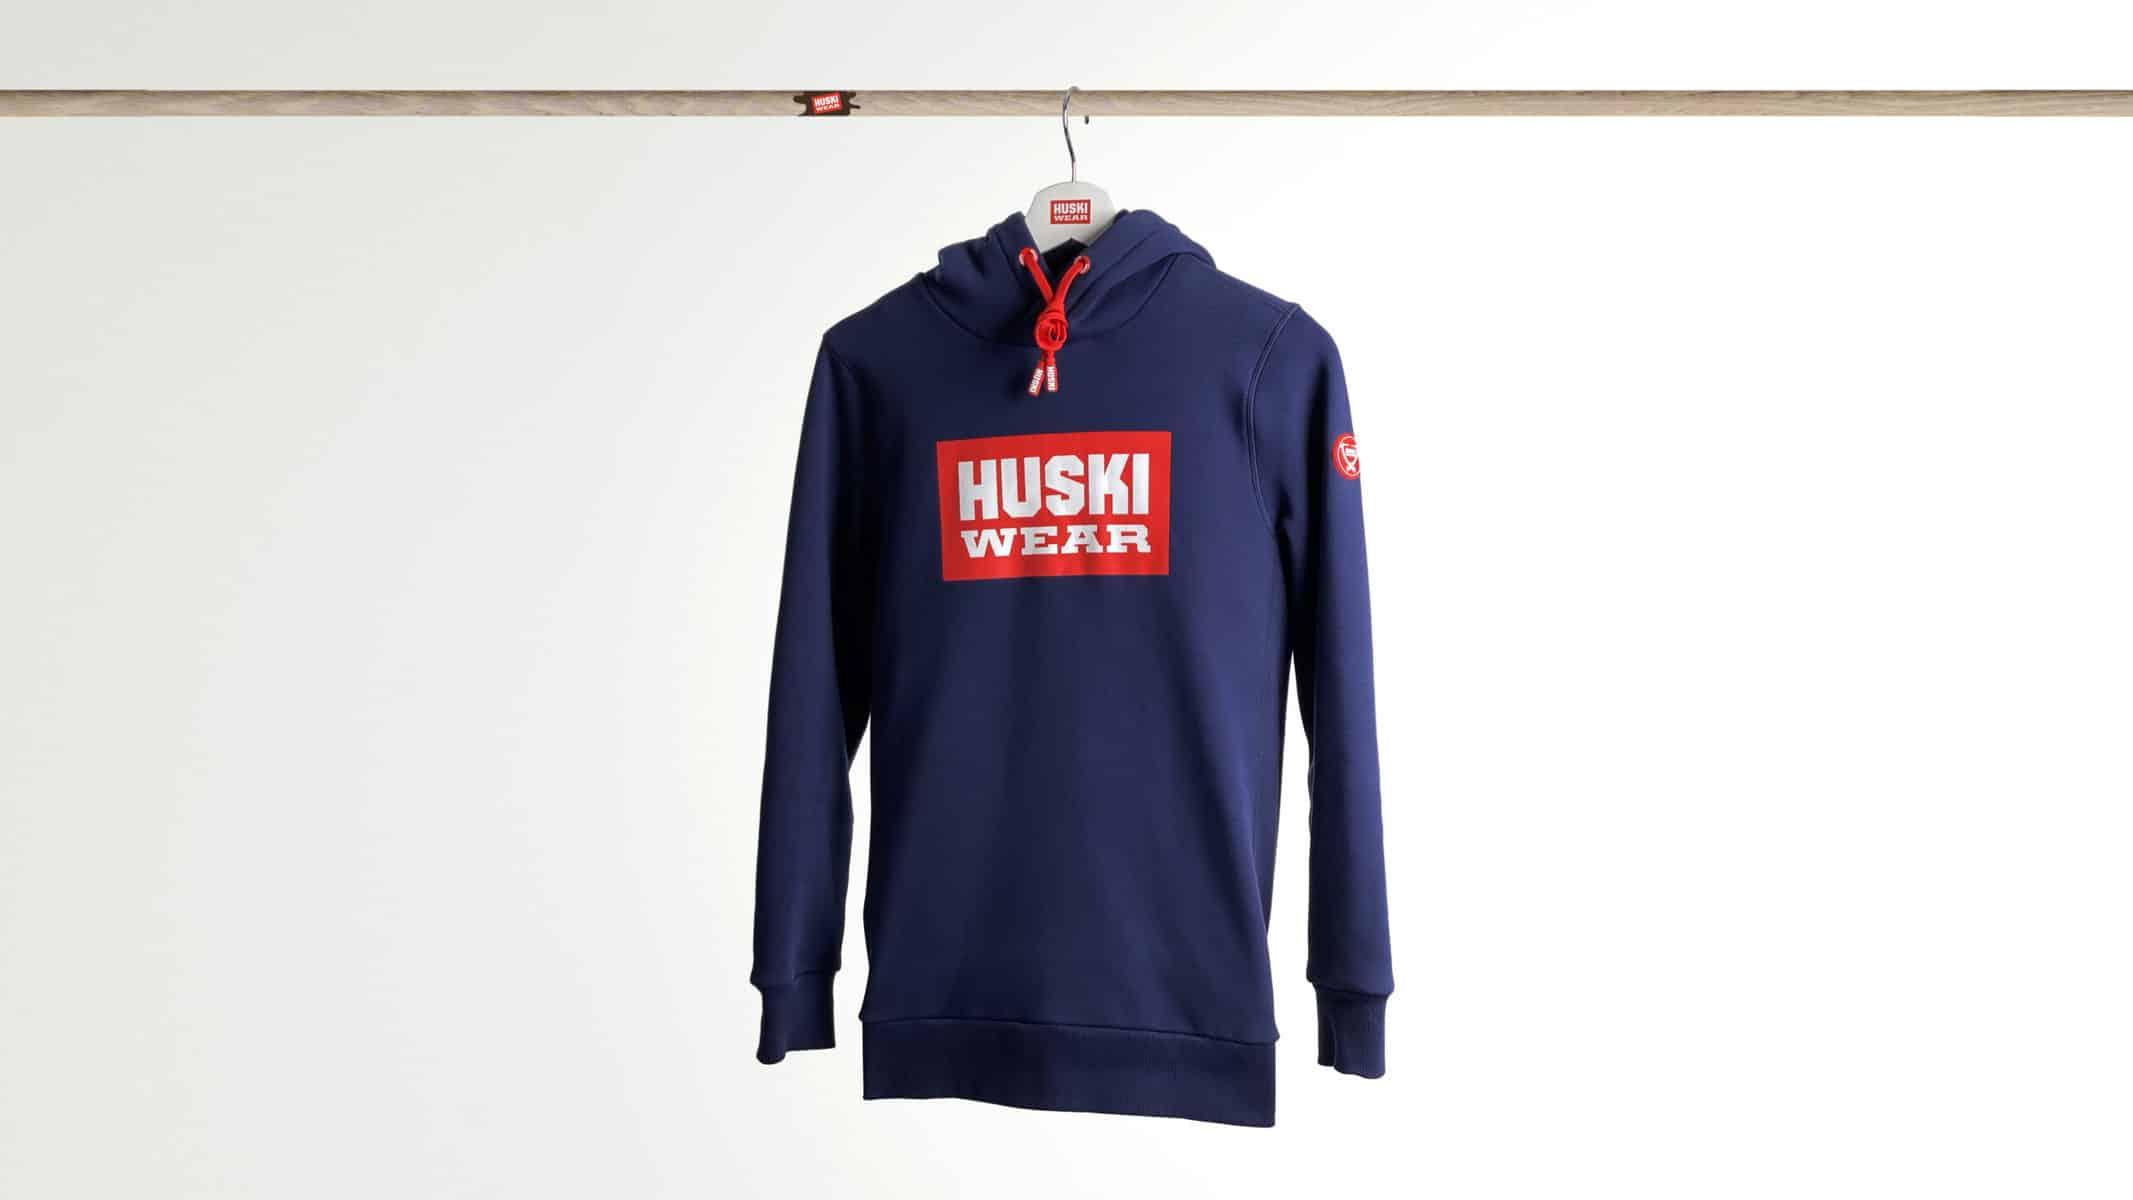 Huski Wear